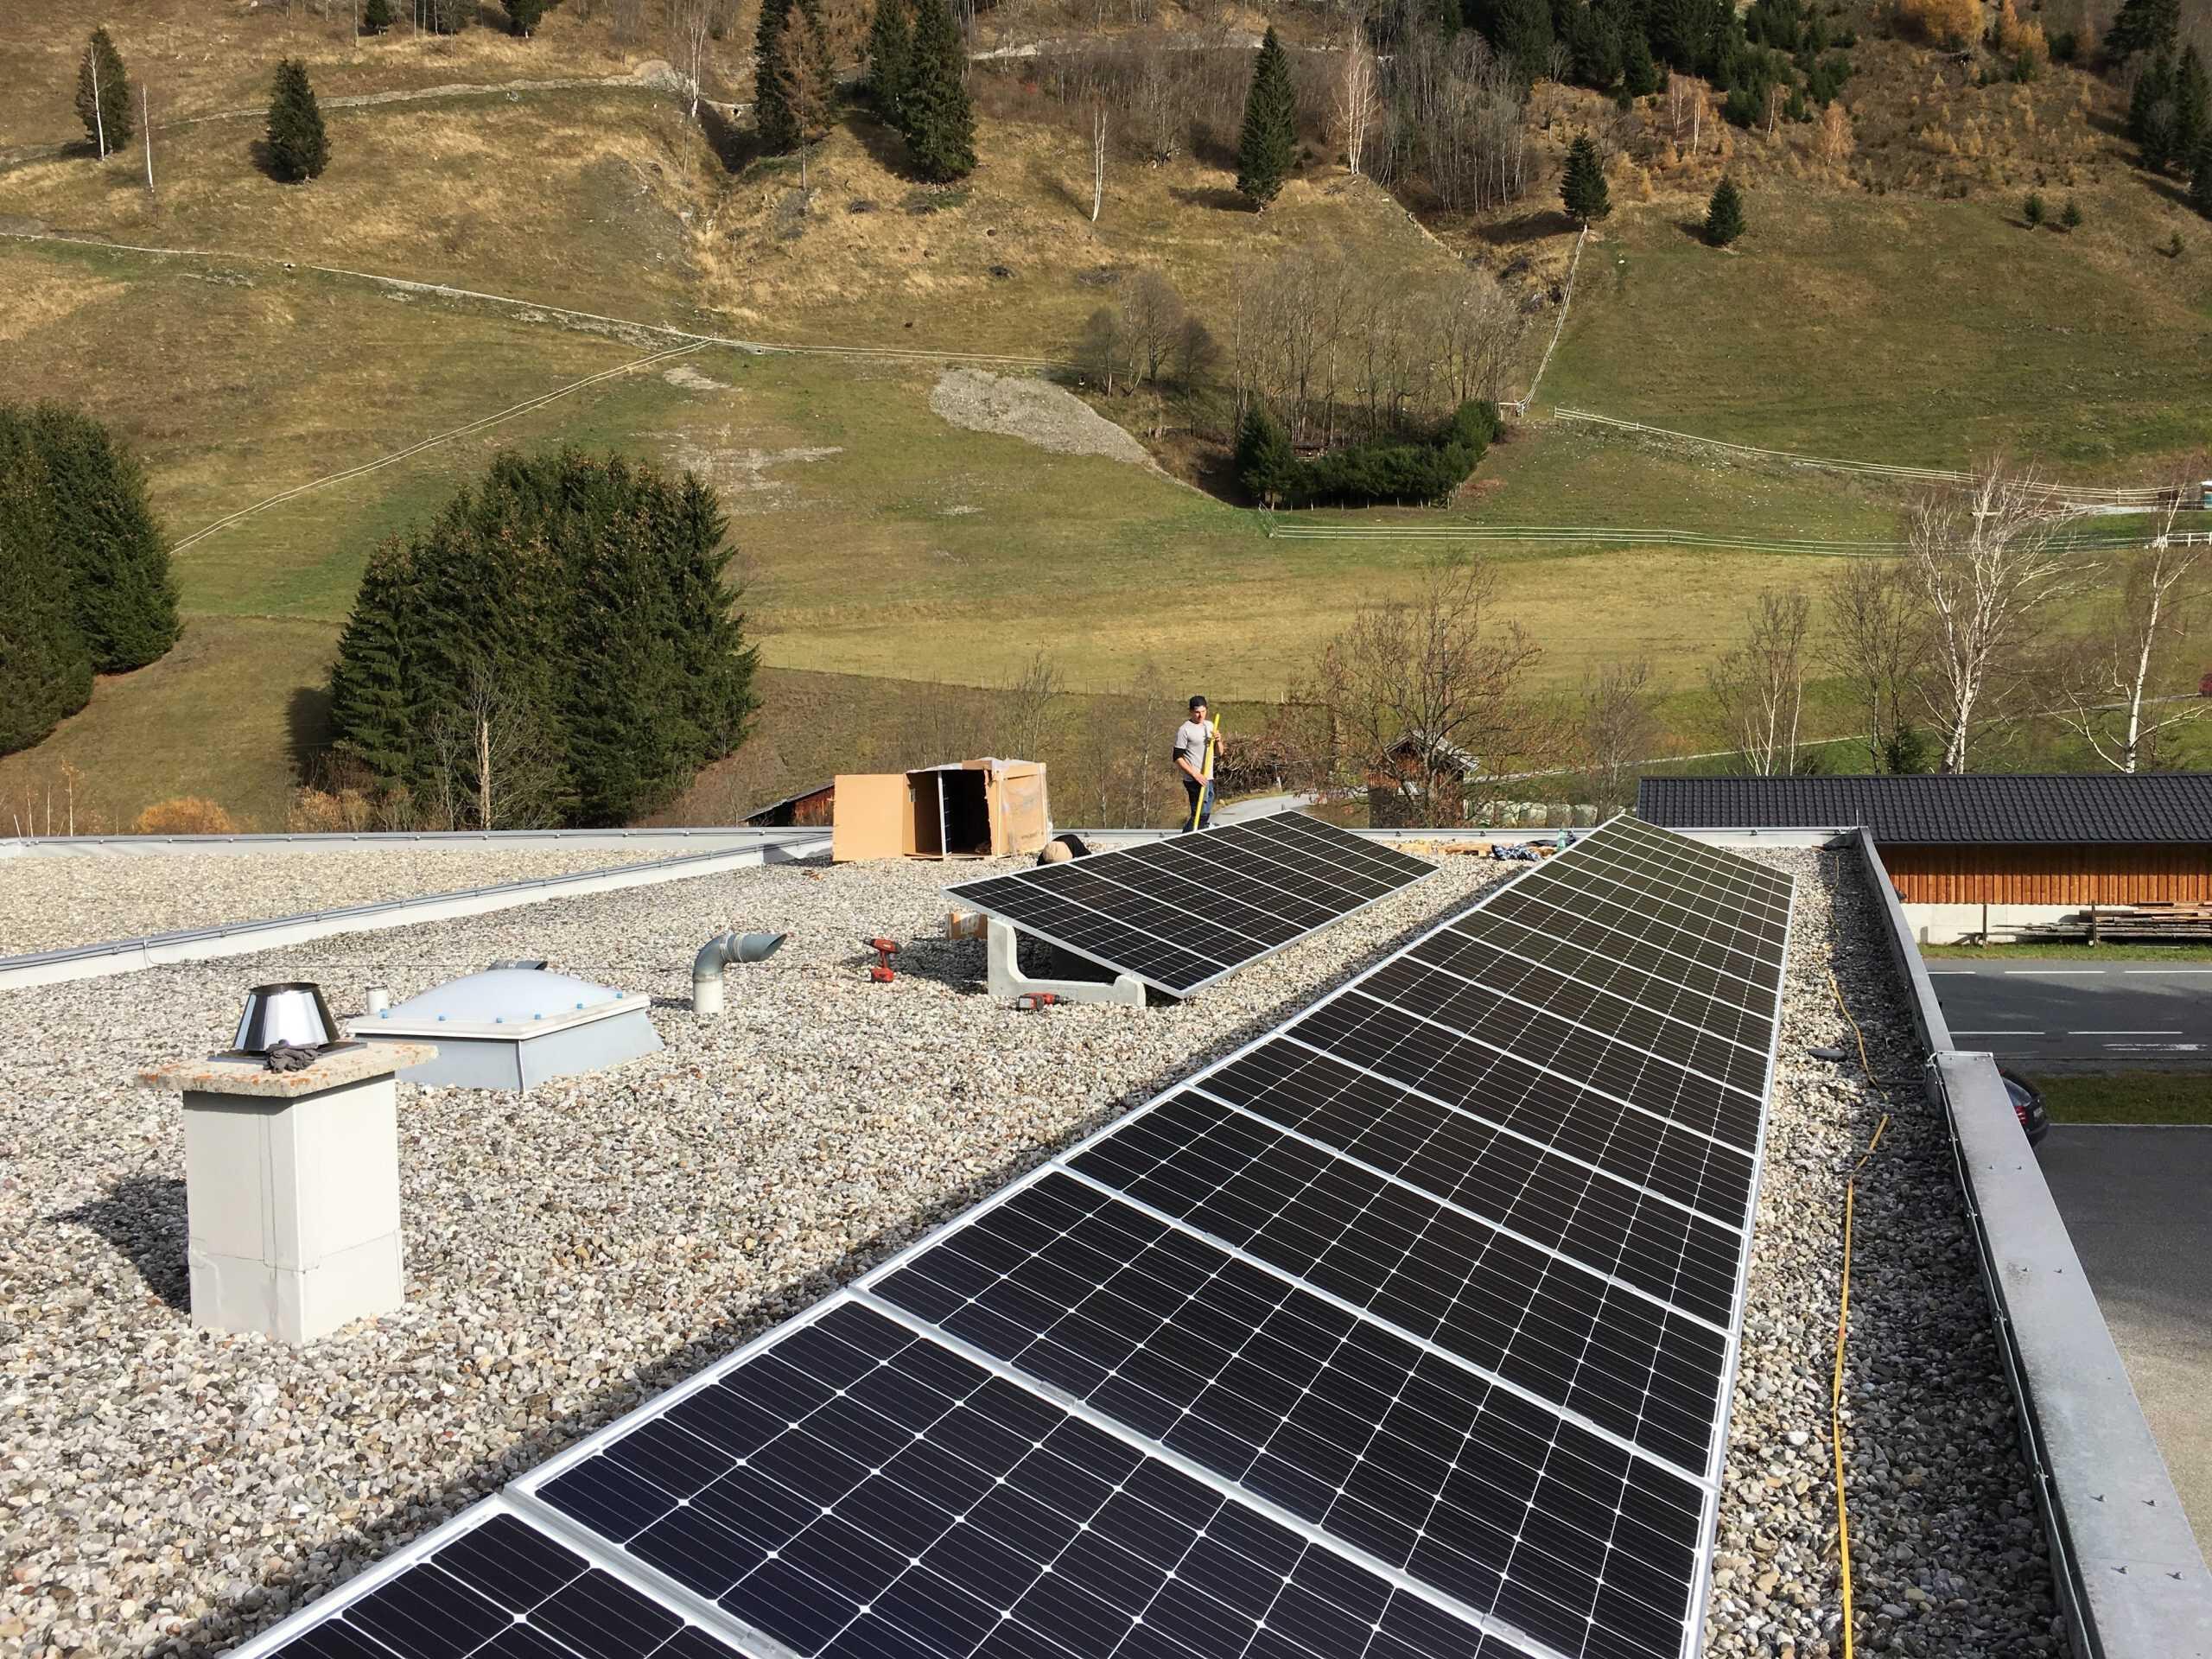 Energieautonom Gmbh  - Hundsdorf - Austria